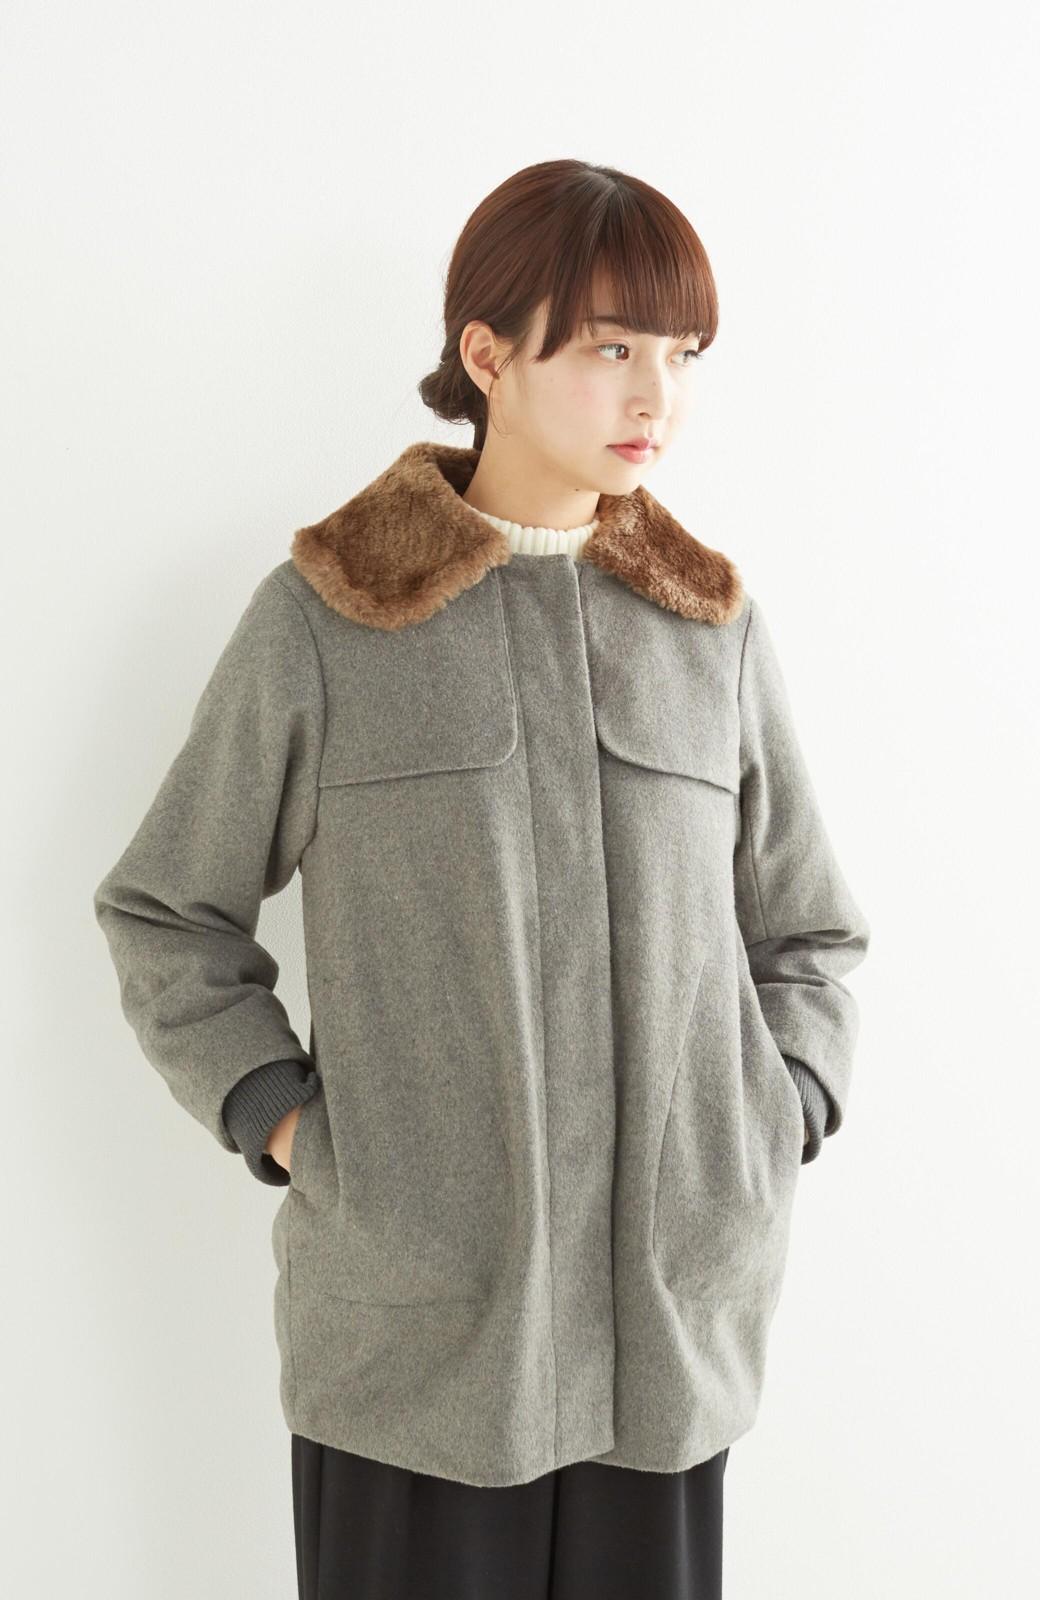 pilvee 取り外しフェイクファー衿付き ウール混のノーカラーコート <グレー>の商品写真15